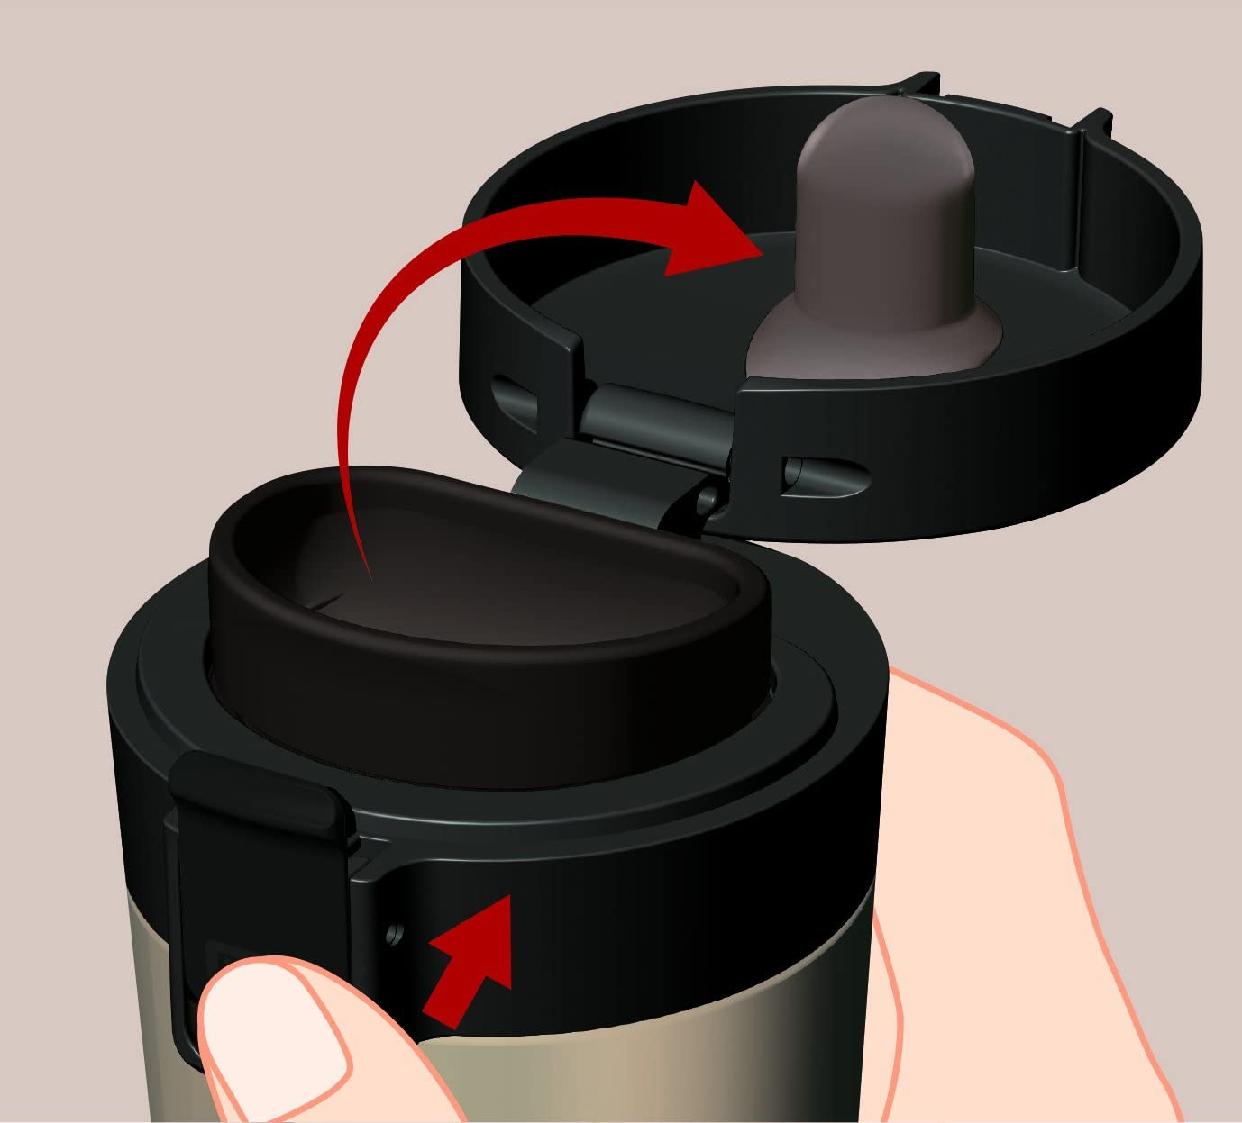 ASVEL(アスベル) 真空断熱携帯タンブラー 290ml シャンパンゴールドの商品画像4